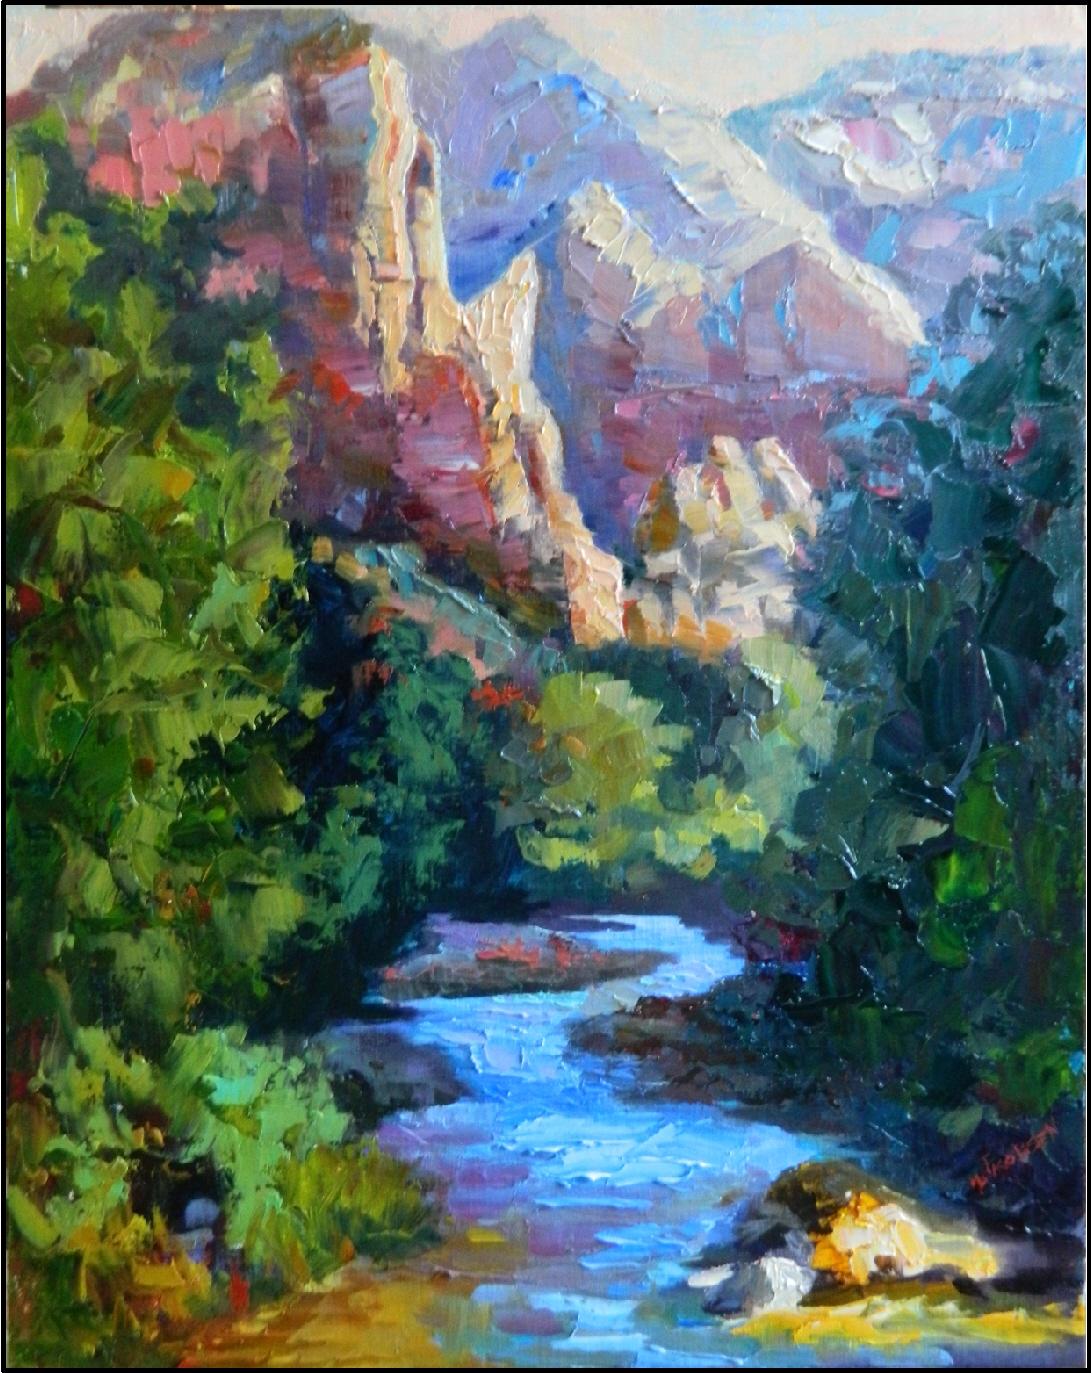 Return to zion 16x20 oil on linen zion national park painting the watchman virgin river palette knife landscapes maryanne jacobsen art